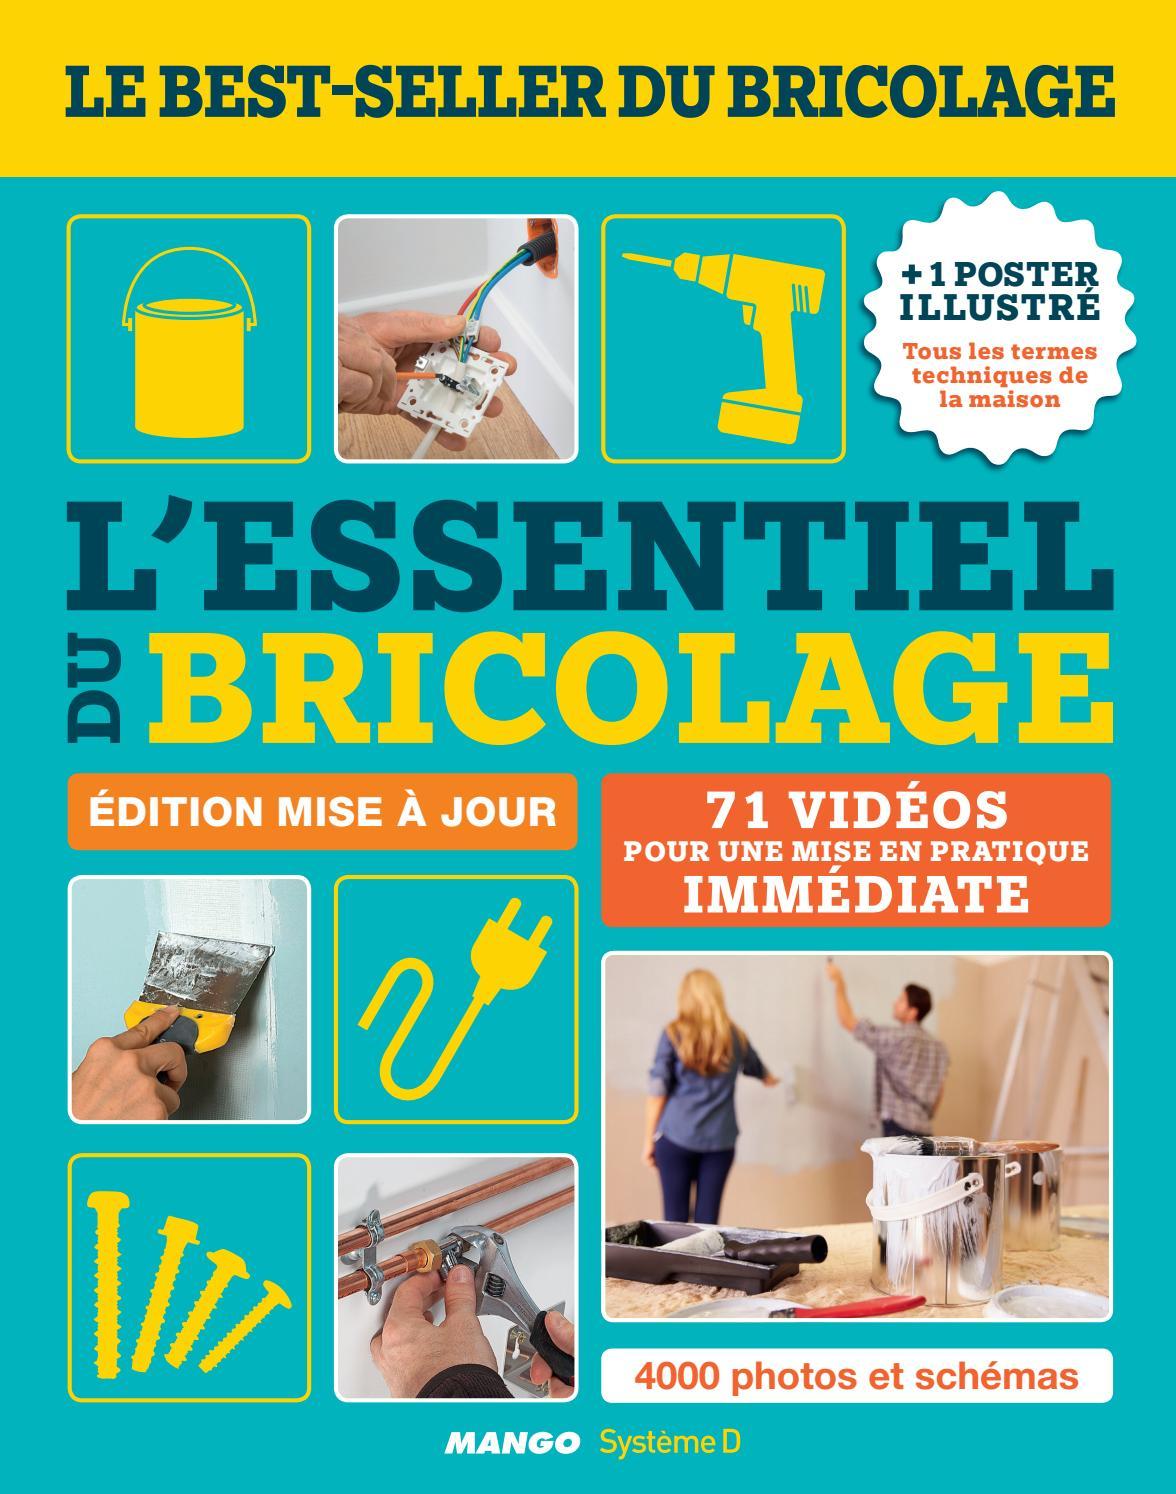 Lessentiel Du Bricolage By Fleurus Editions Issuu